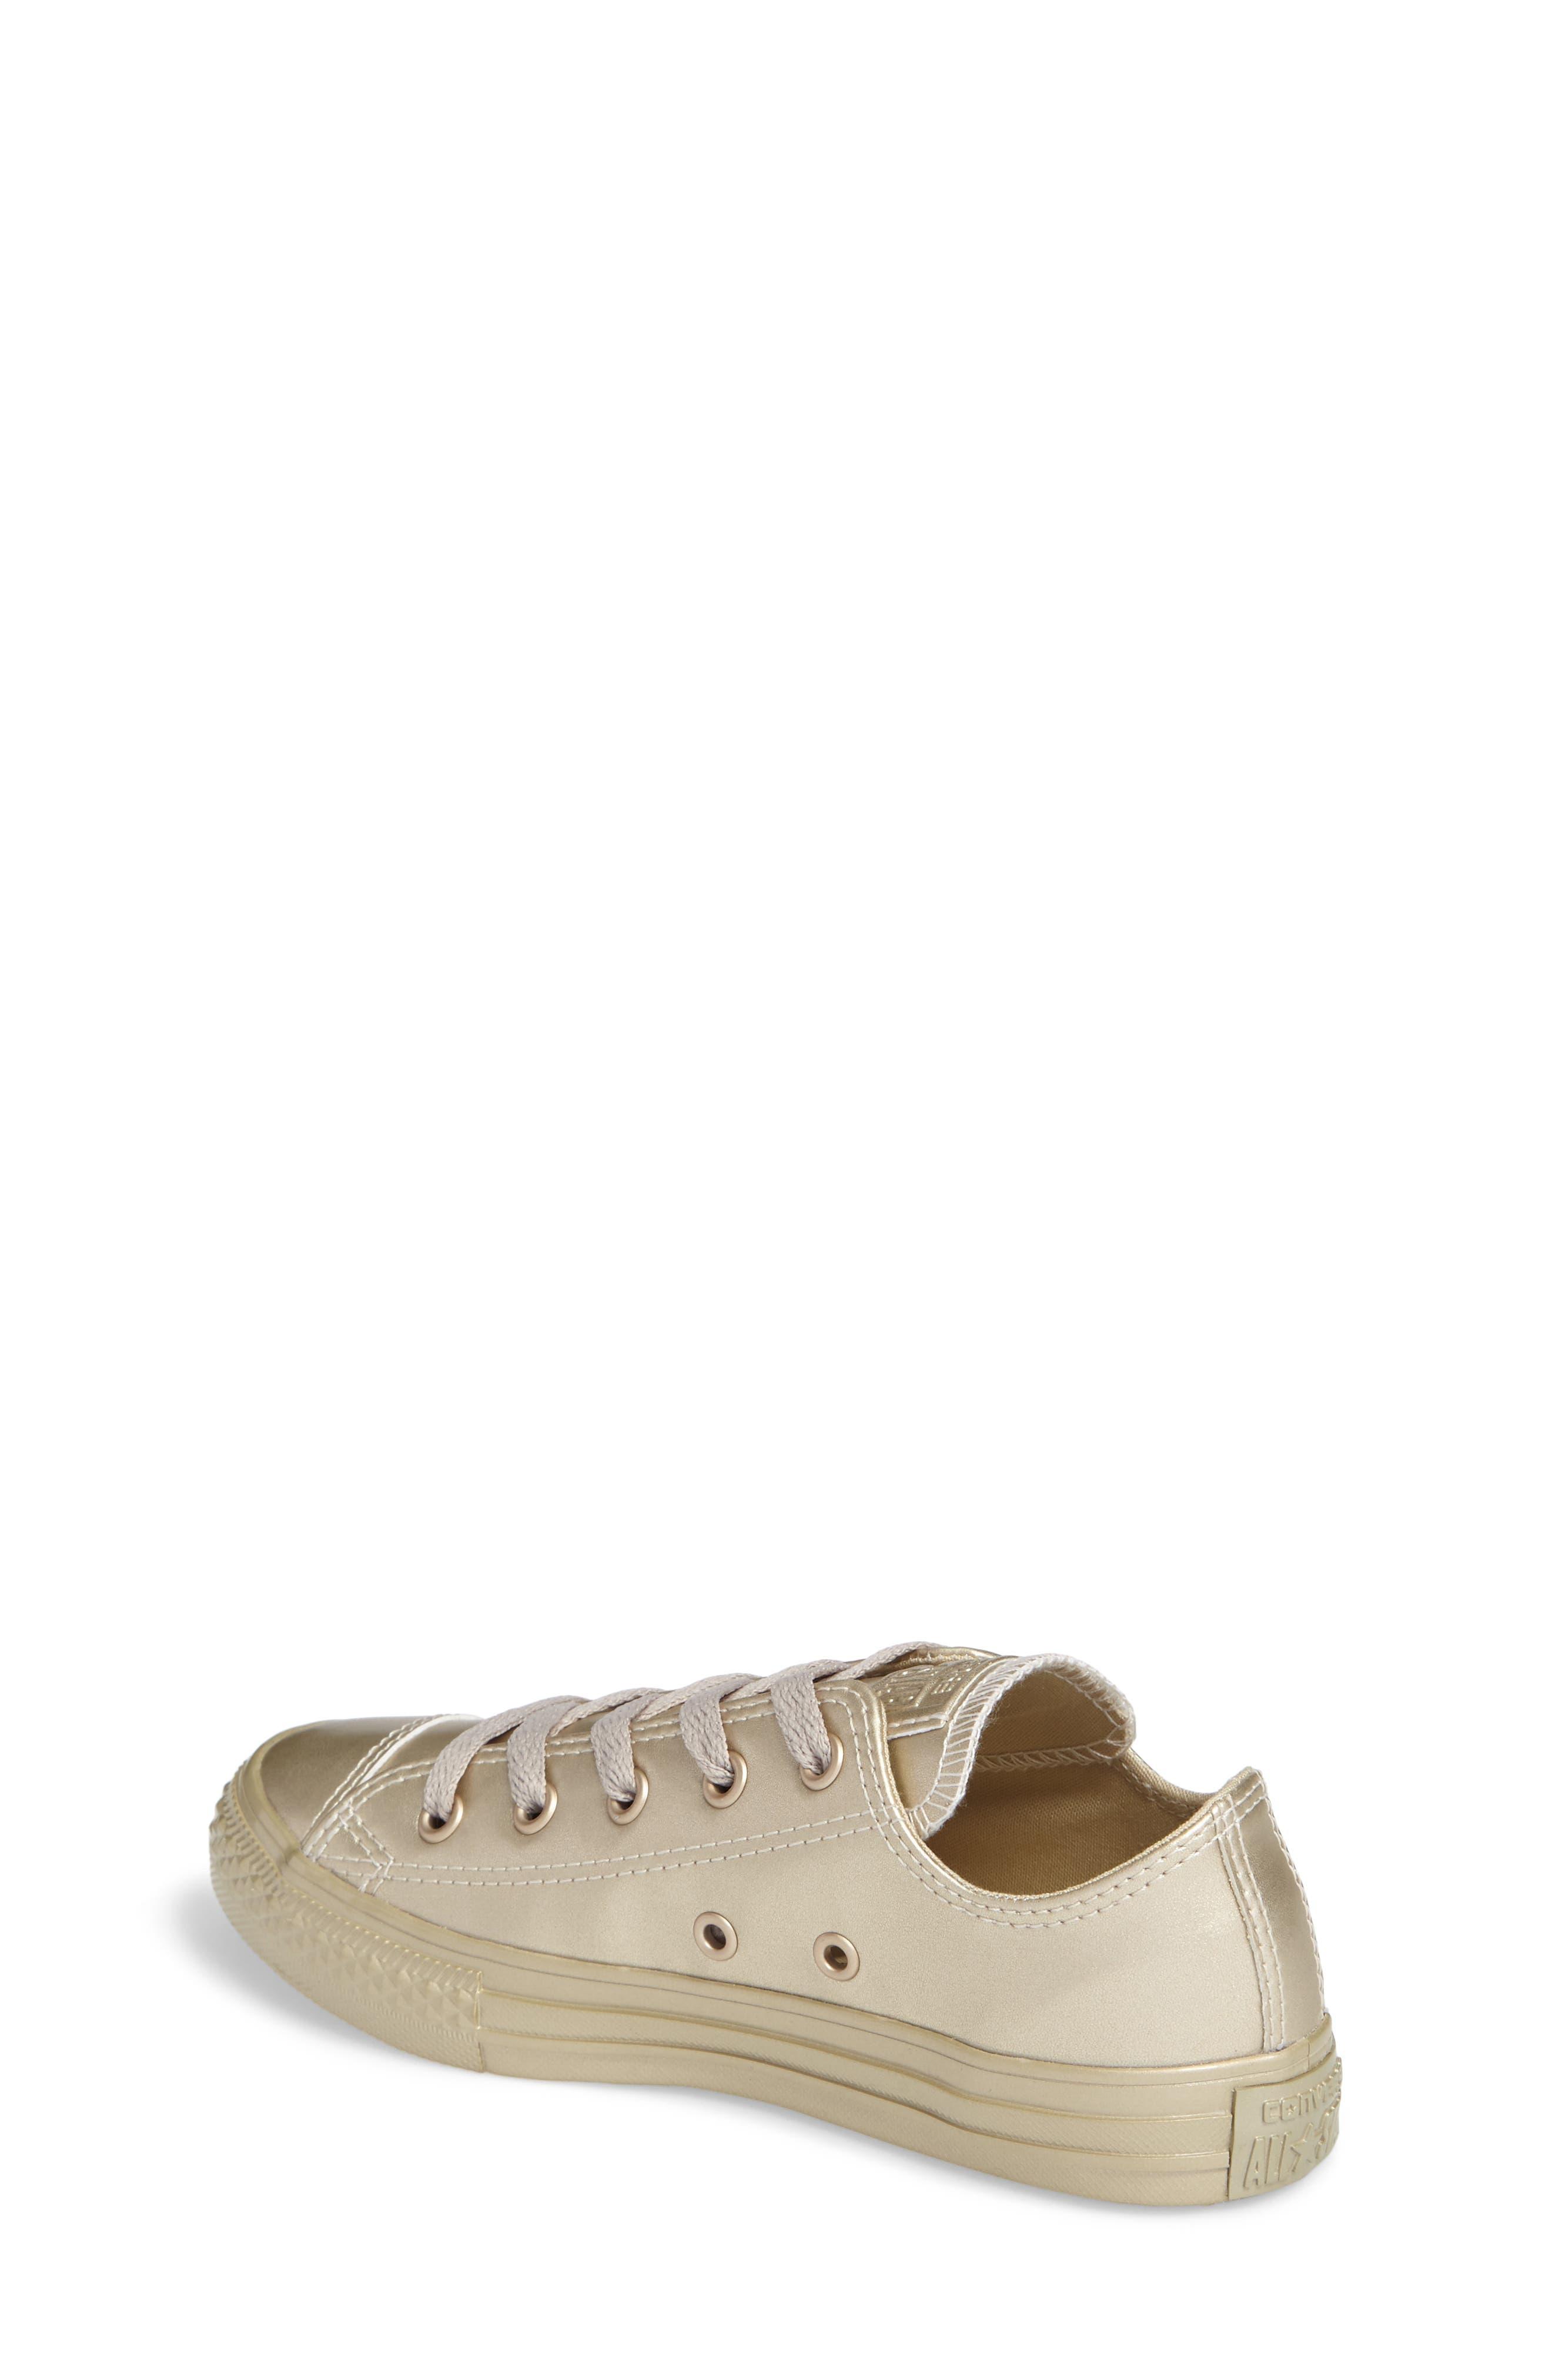 Alternate Image 2  - Converse Chuck Taylor® All Star® Mono Metallic Low Top Sneaker (Toddler & Little Kid)